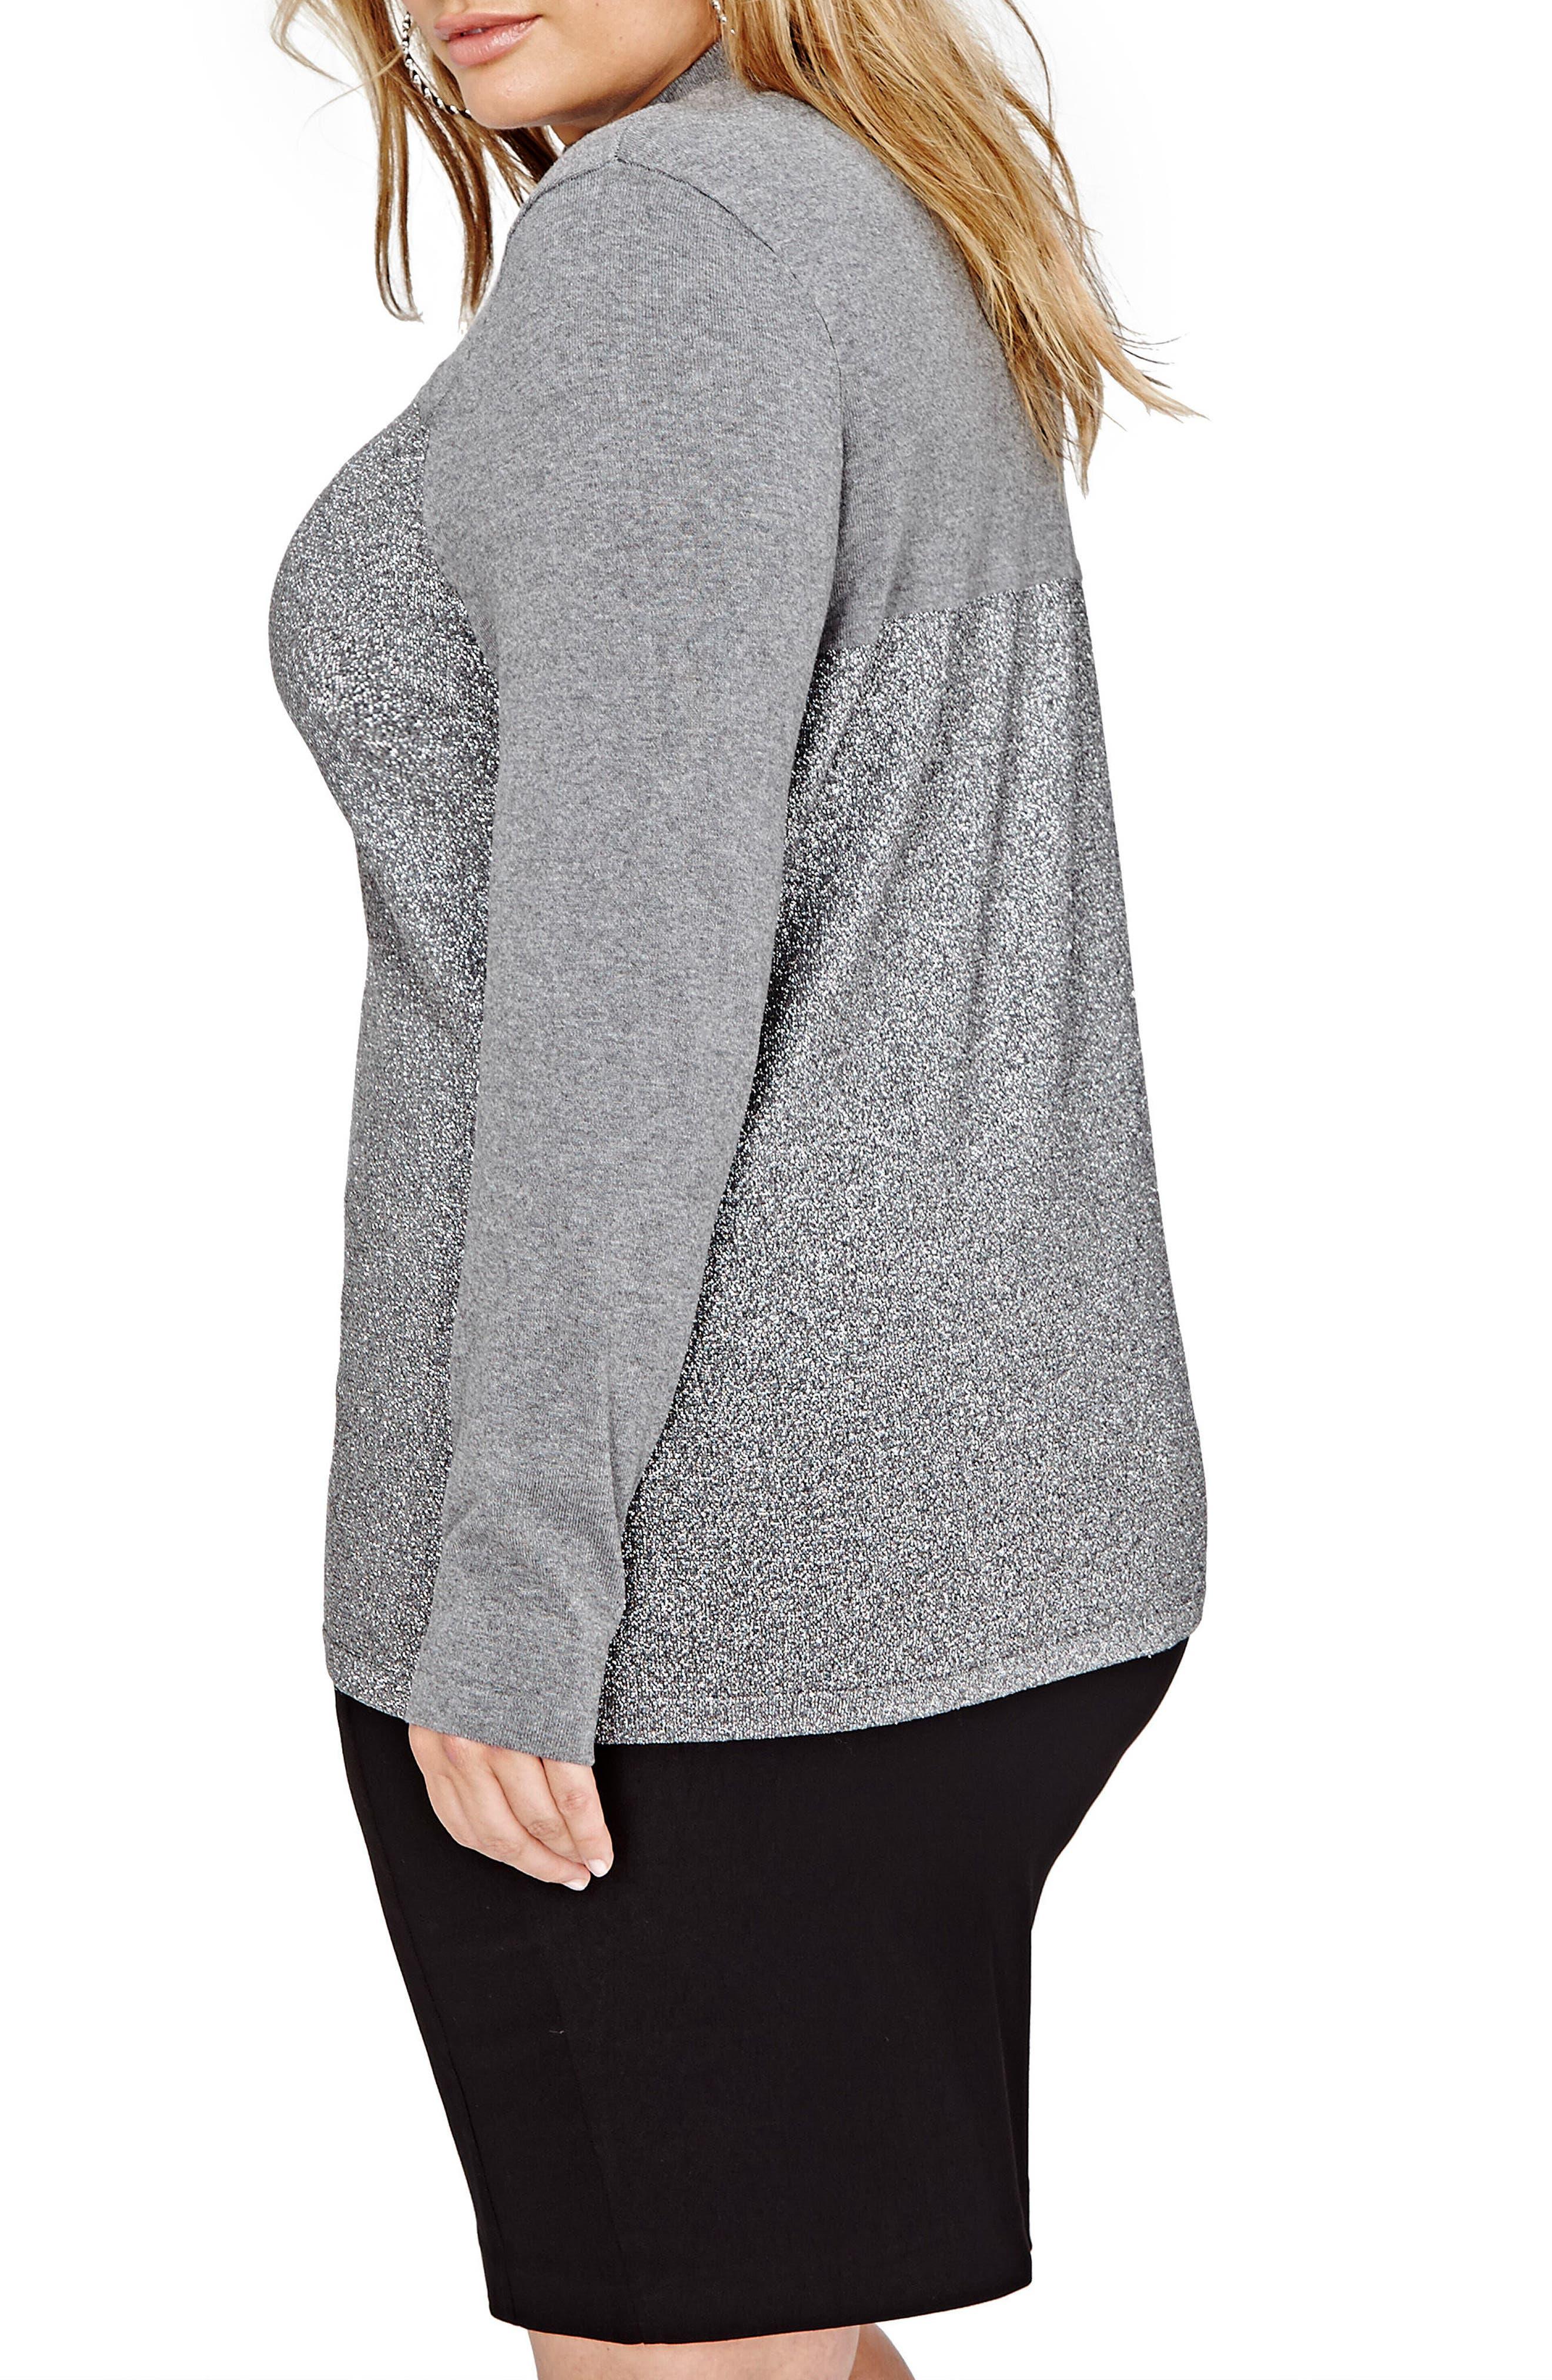 Peekaboo Cutout Sweater,                             Alternate thumbnail 2, color,                             Med Grey Mix